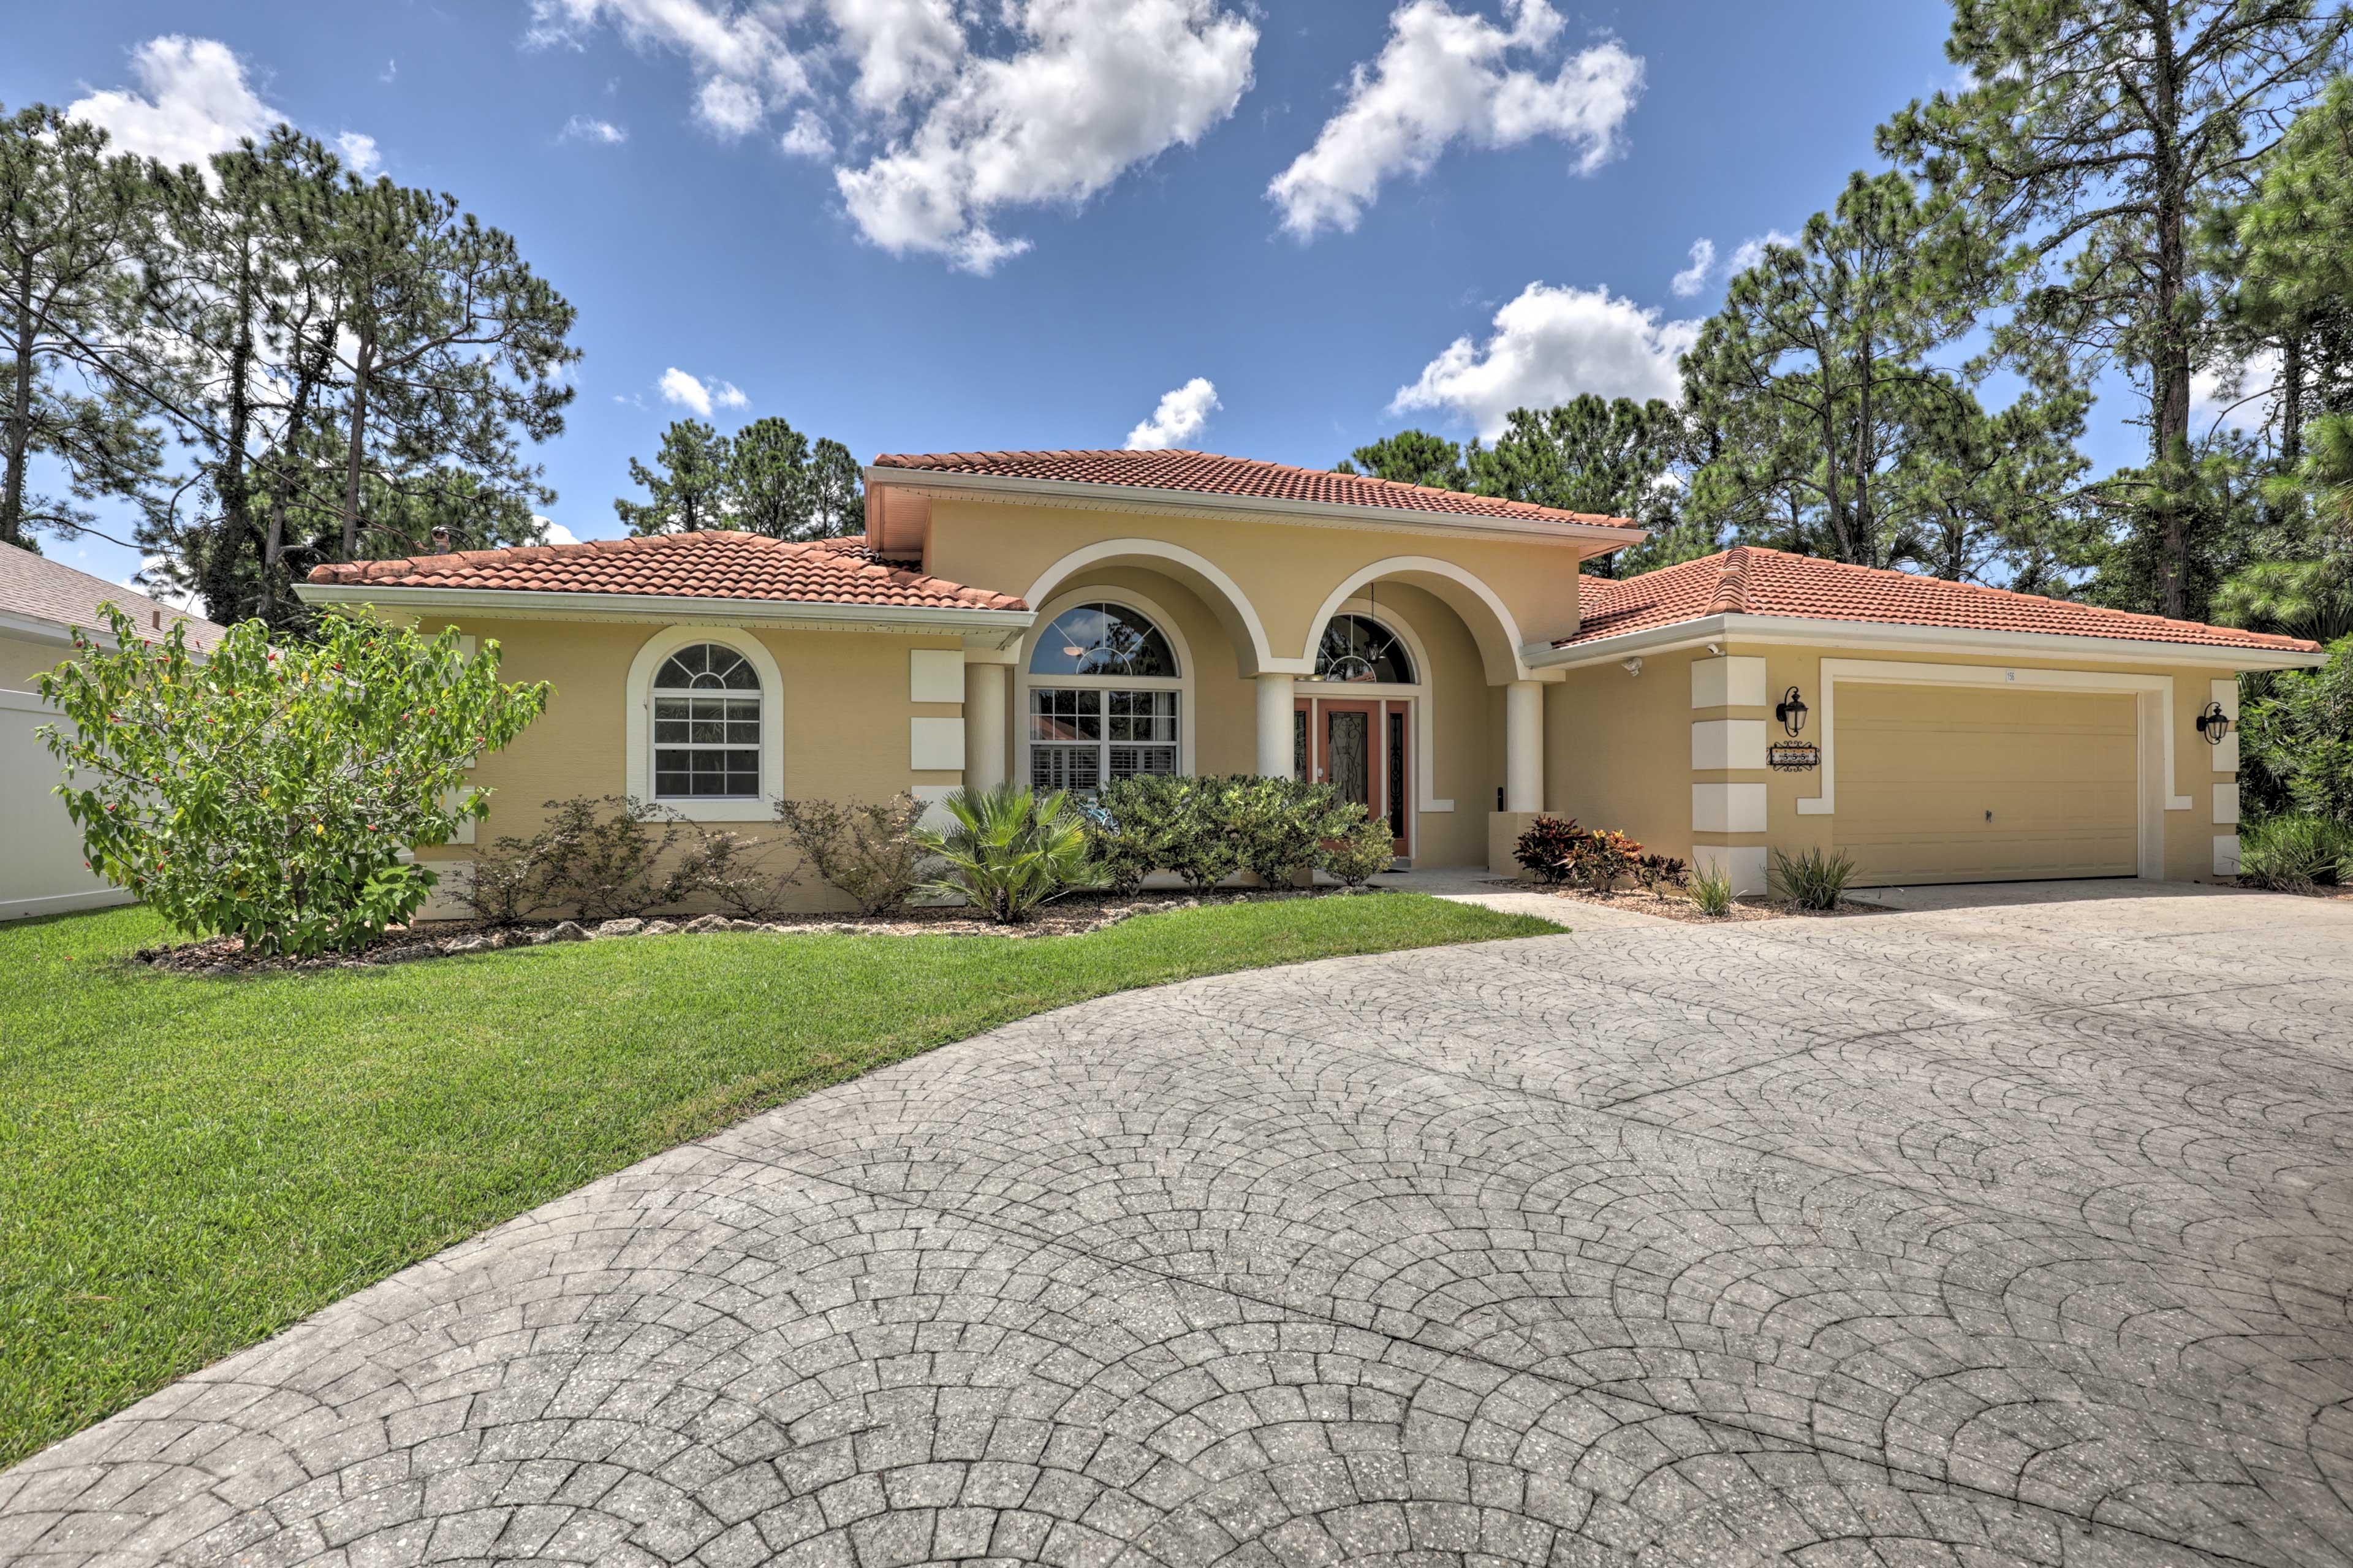 Your next Florida trip awaits at this Palm Coast home.